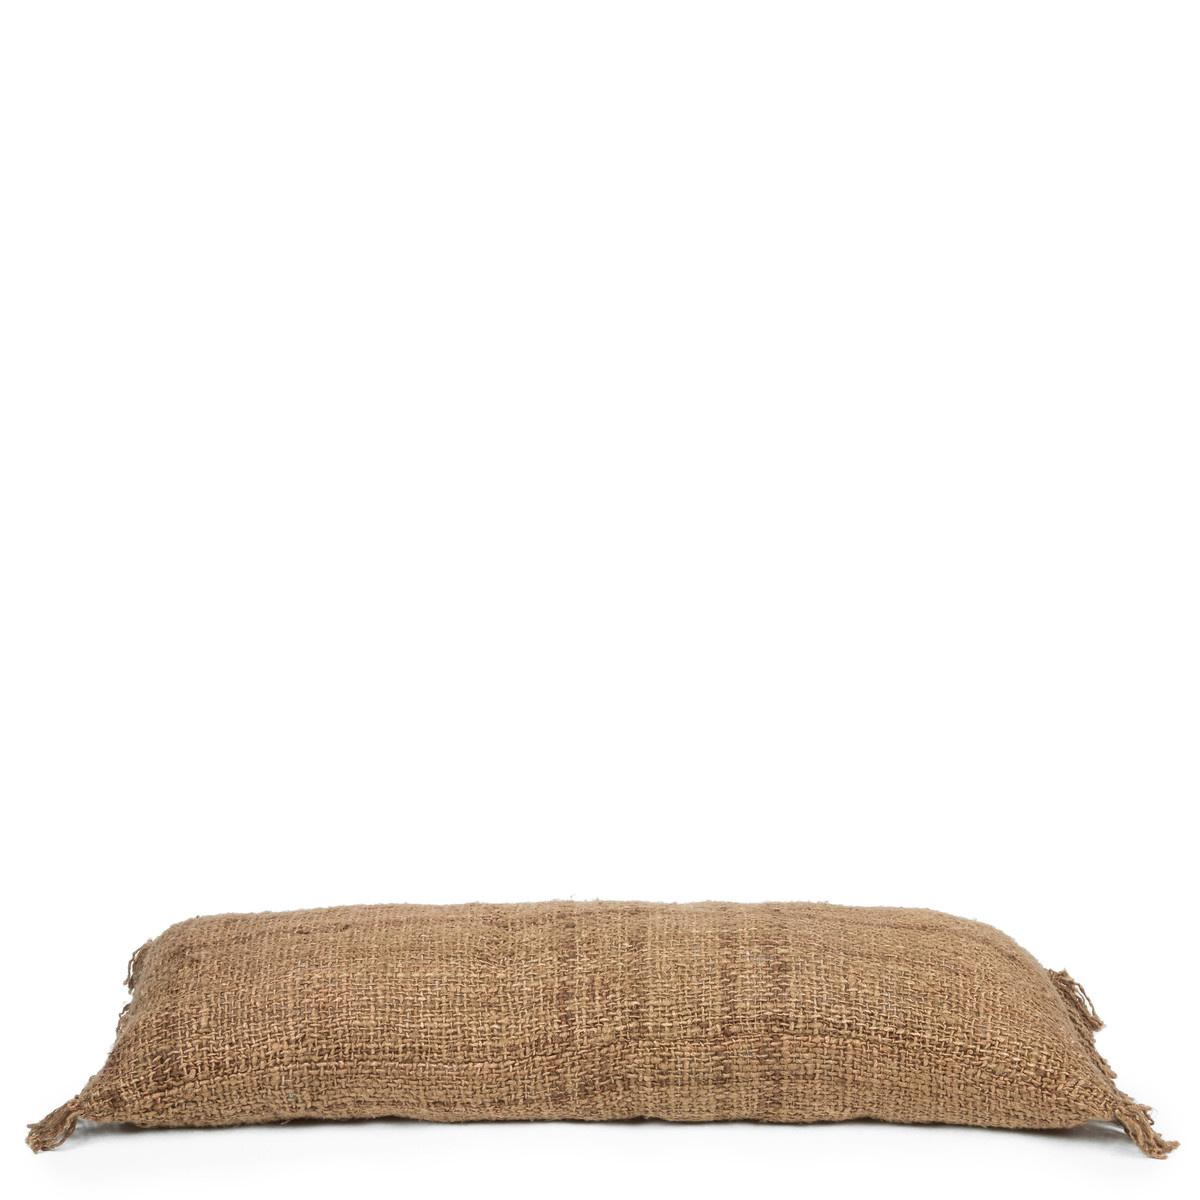 Bazar Bizar Coussin Boho - naturel - L100xW35cm